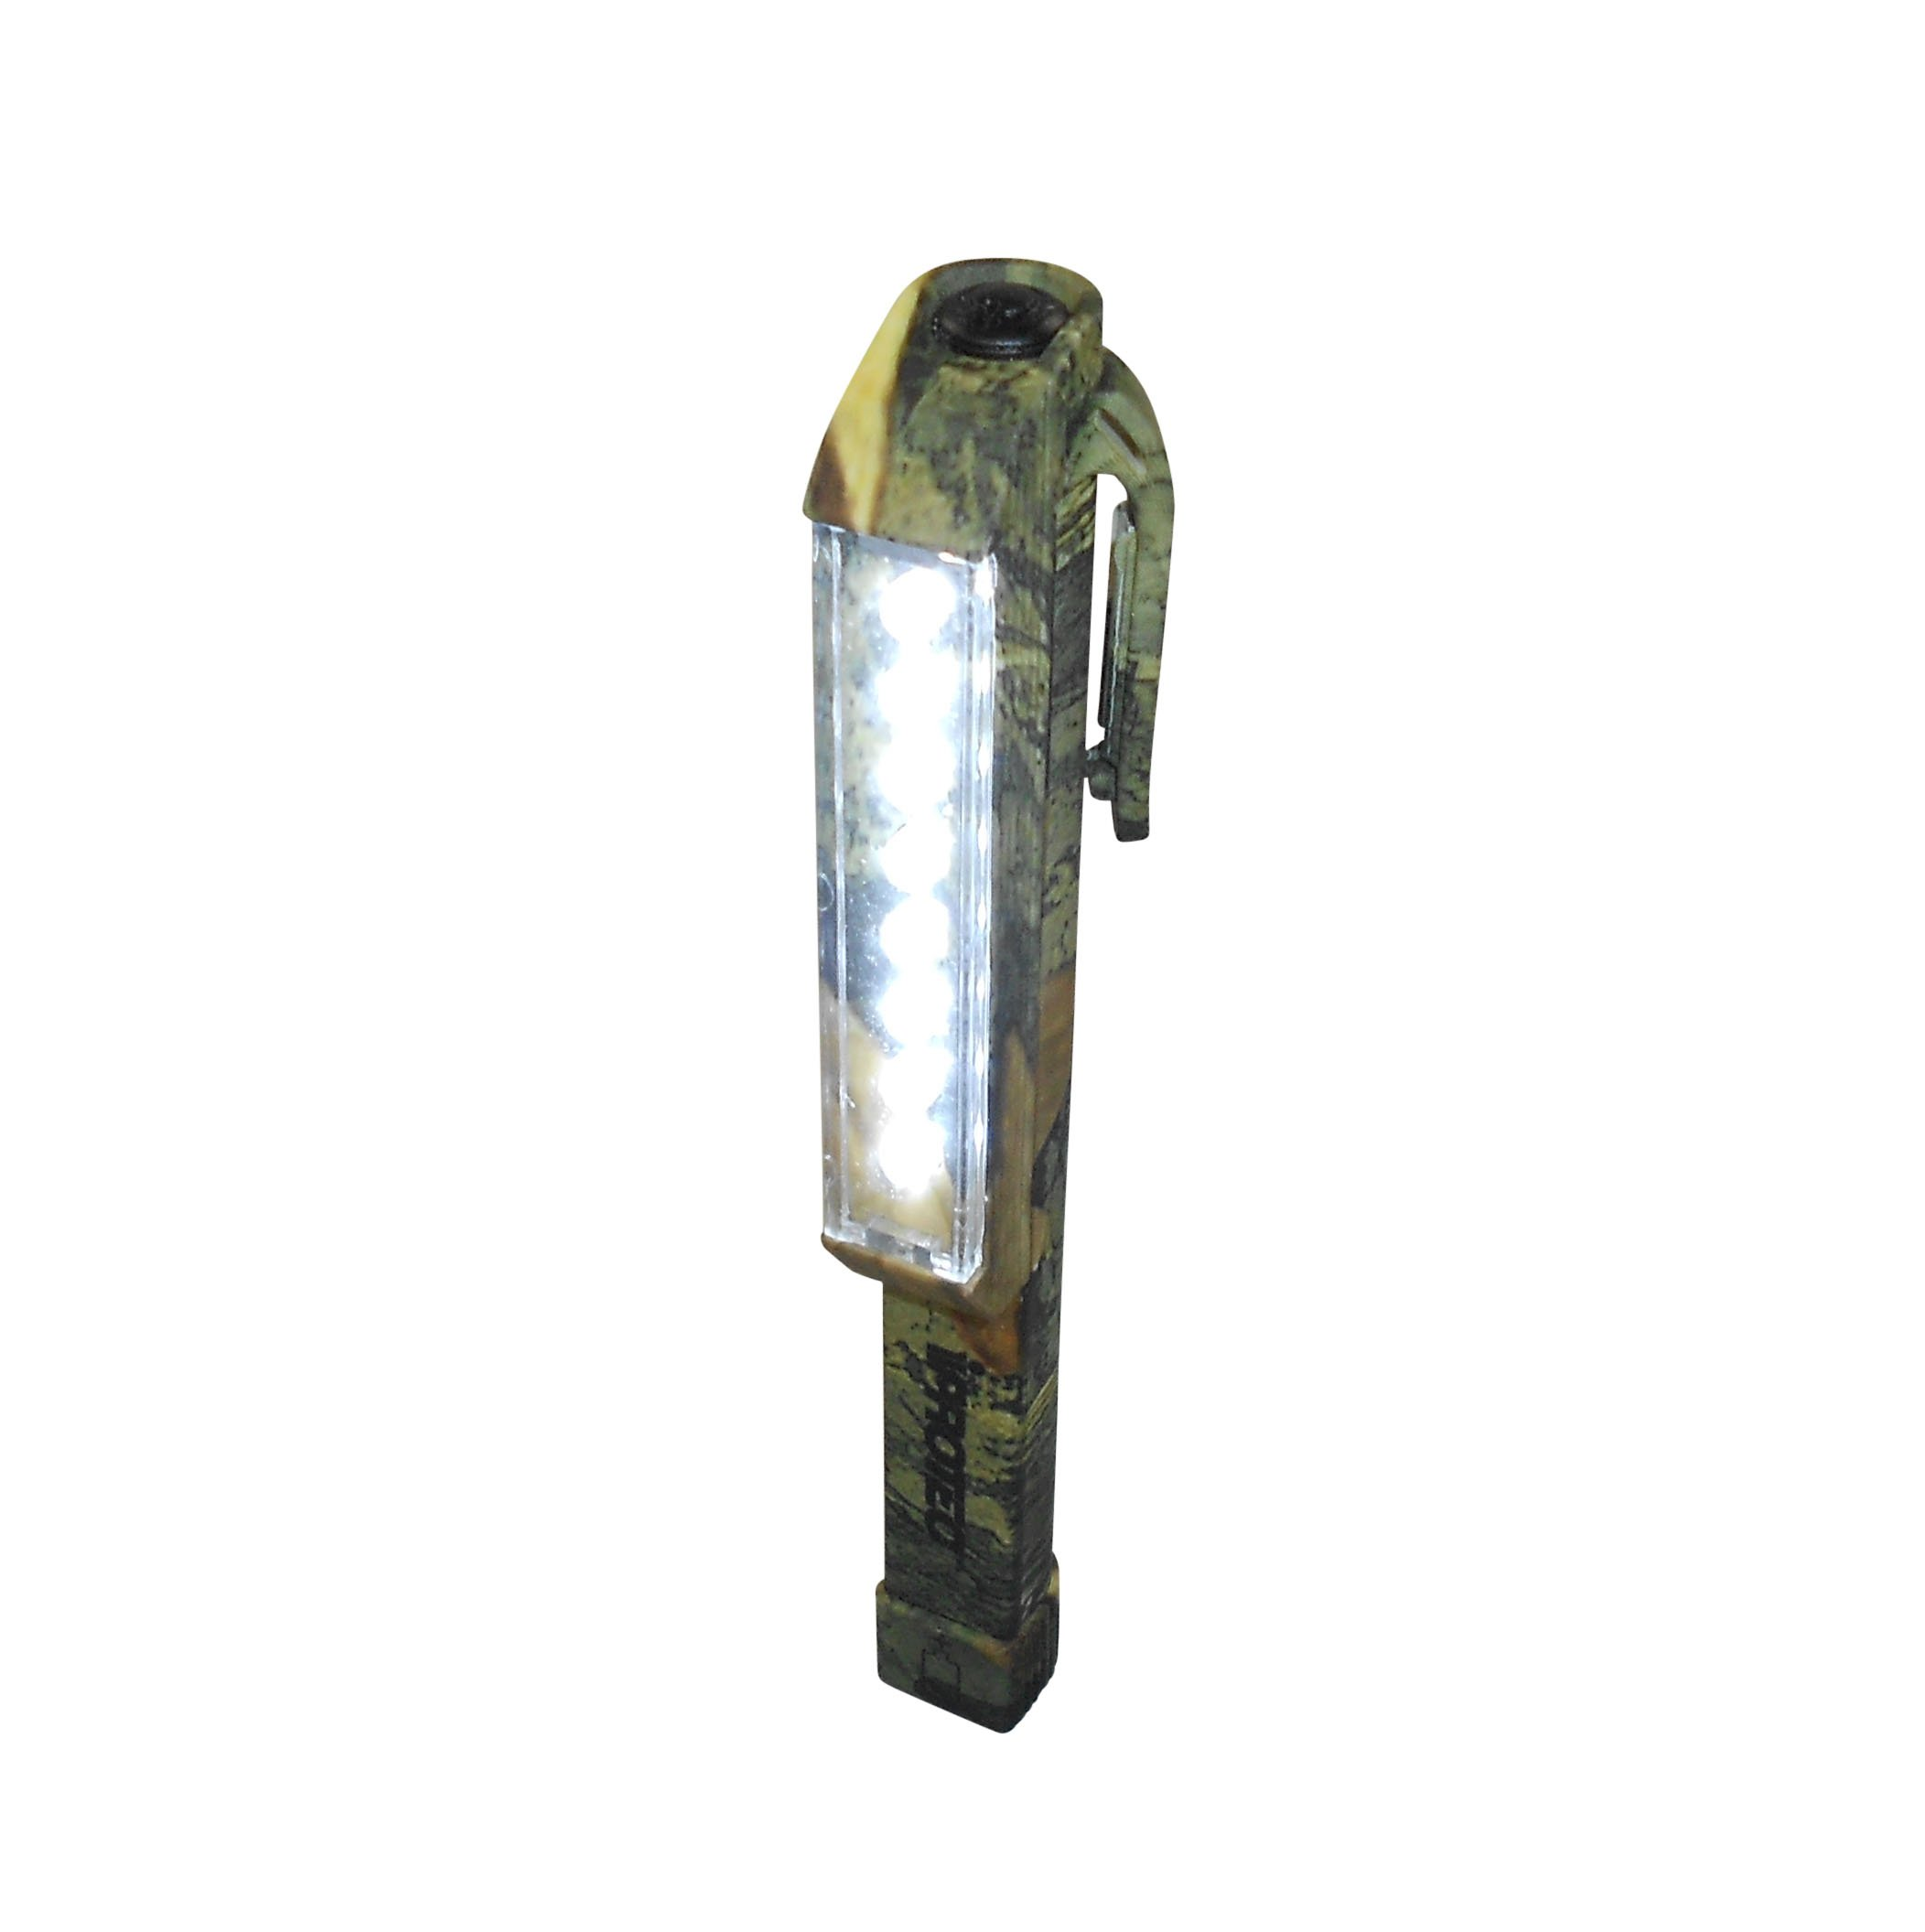 iProtec Pocket Light, Camo